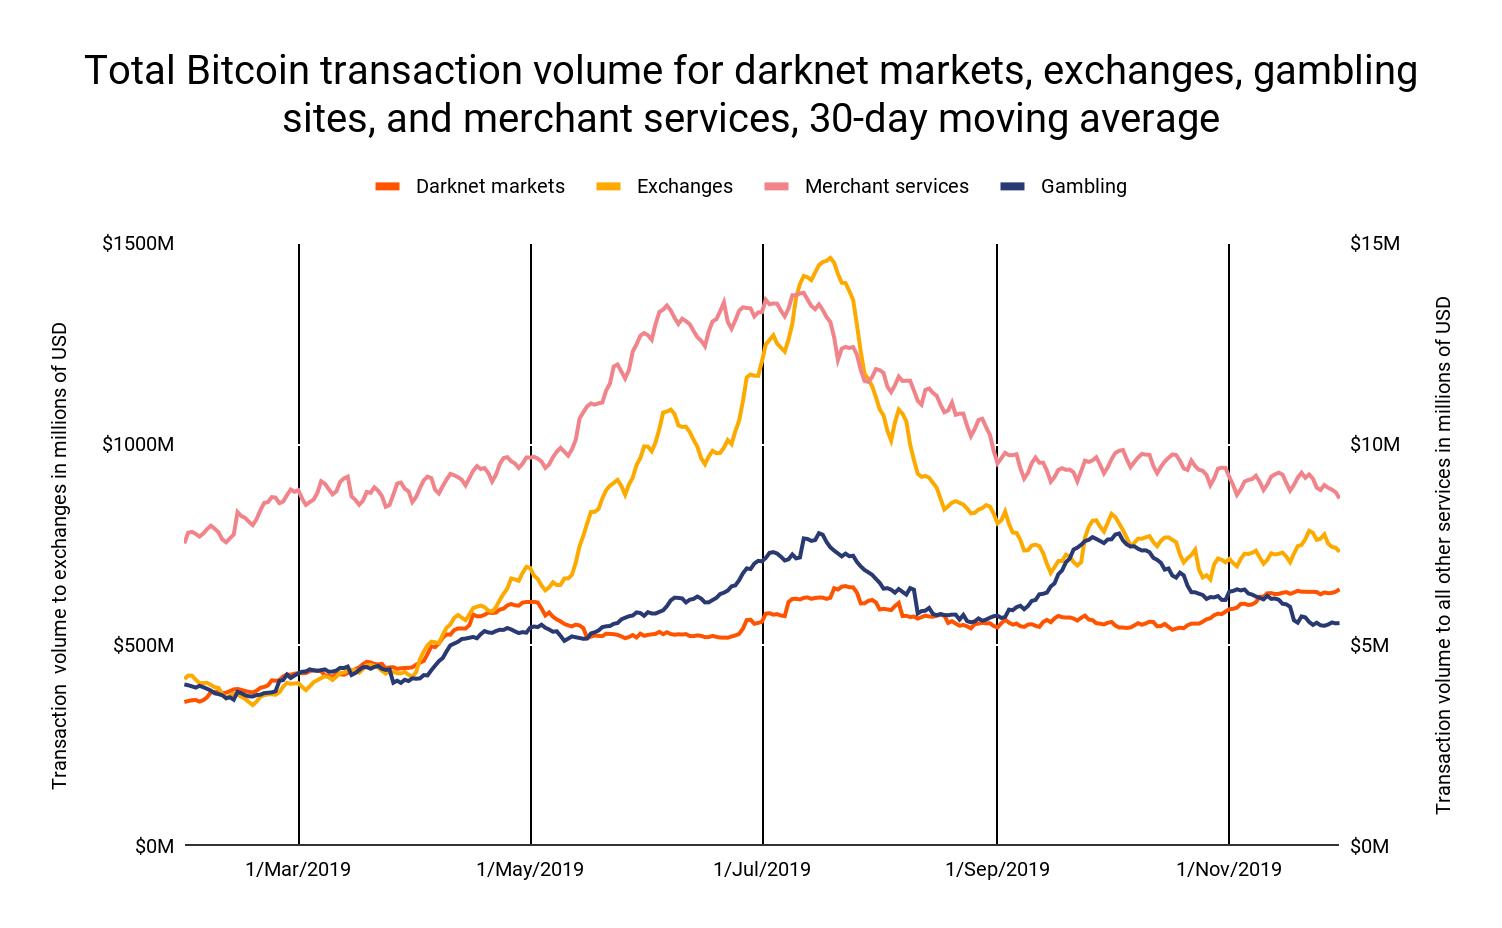 Chainalysis: популярность биткоина в даркнете продолжает расти